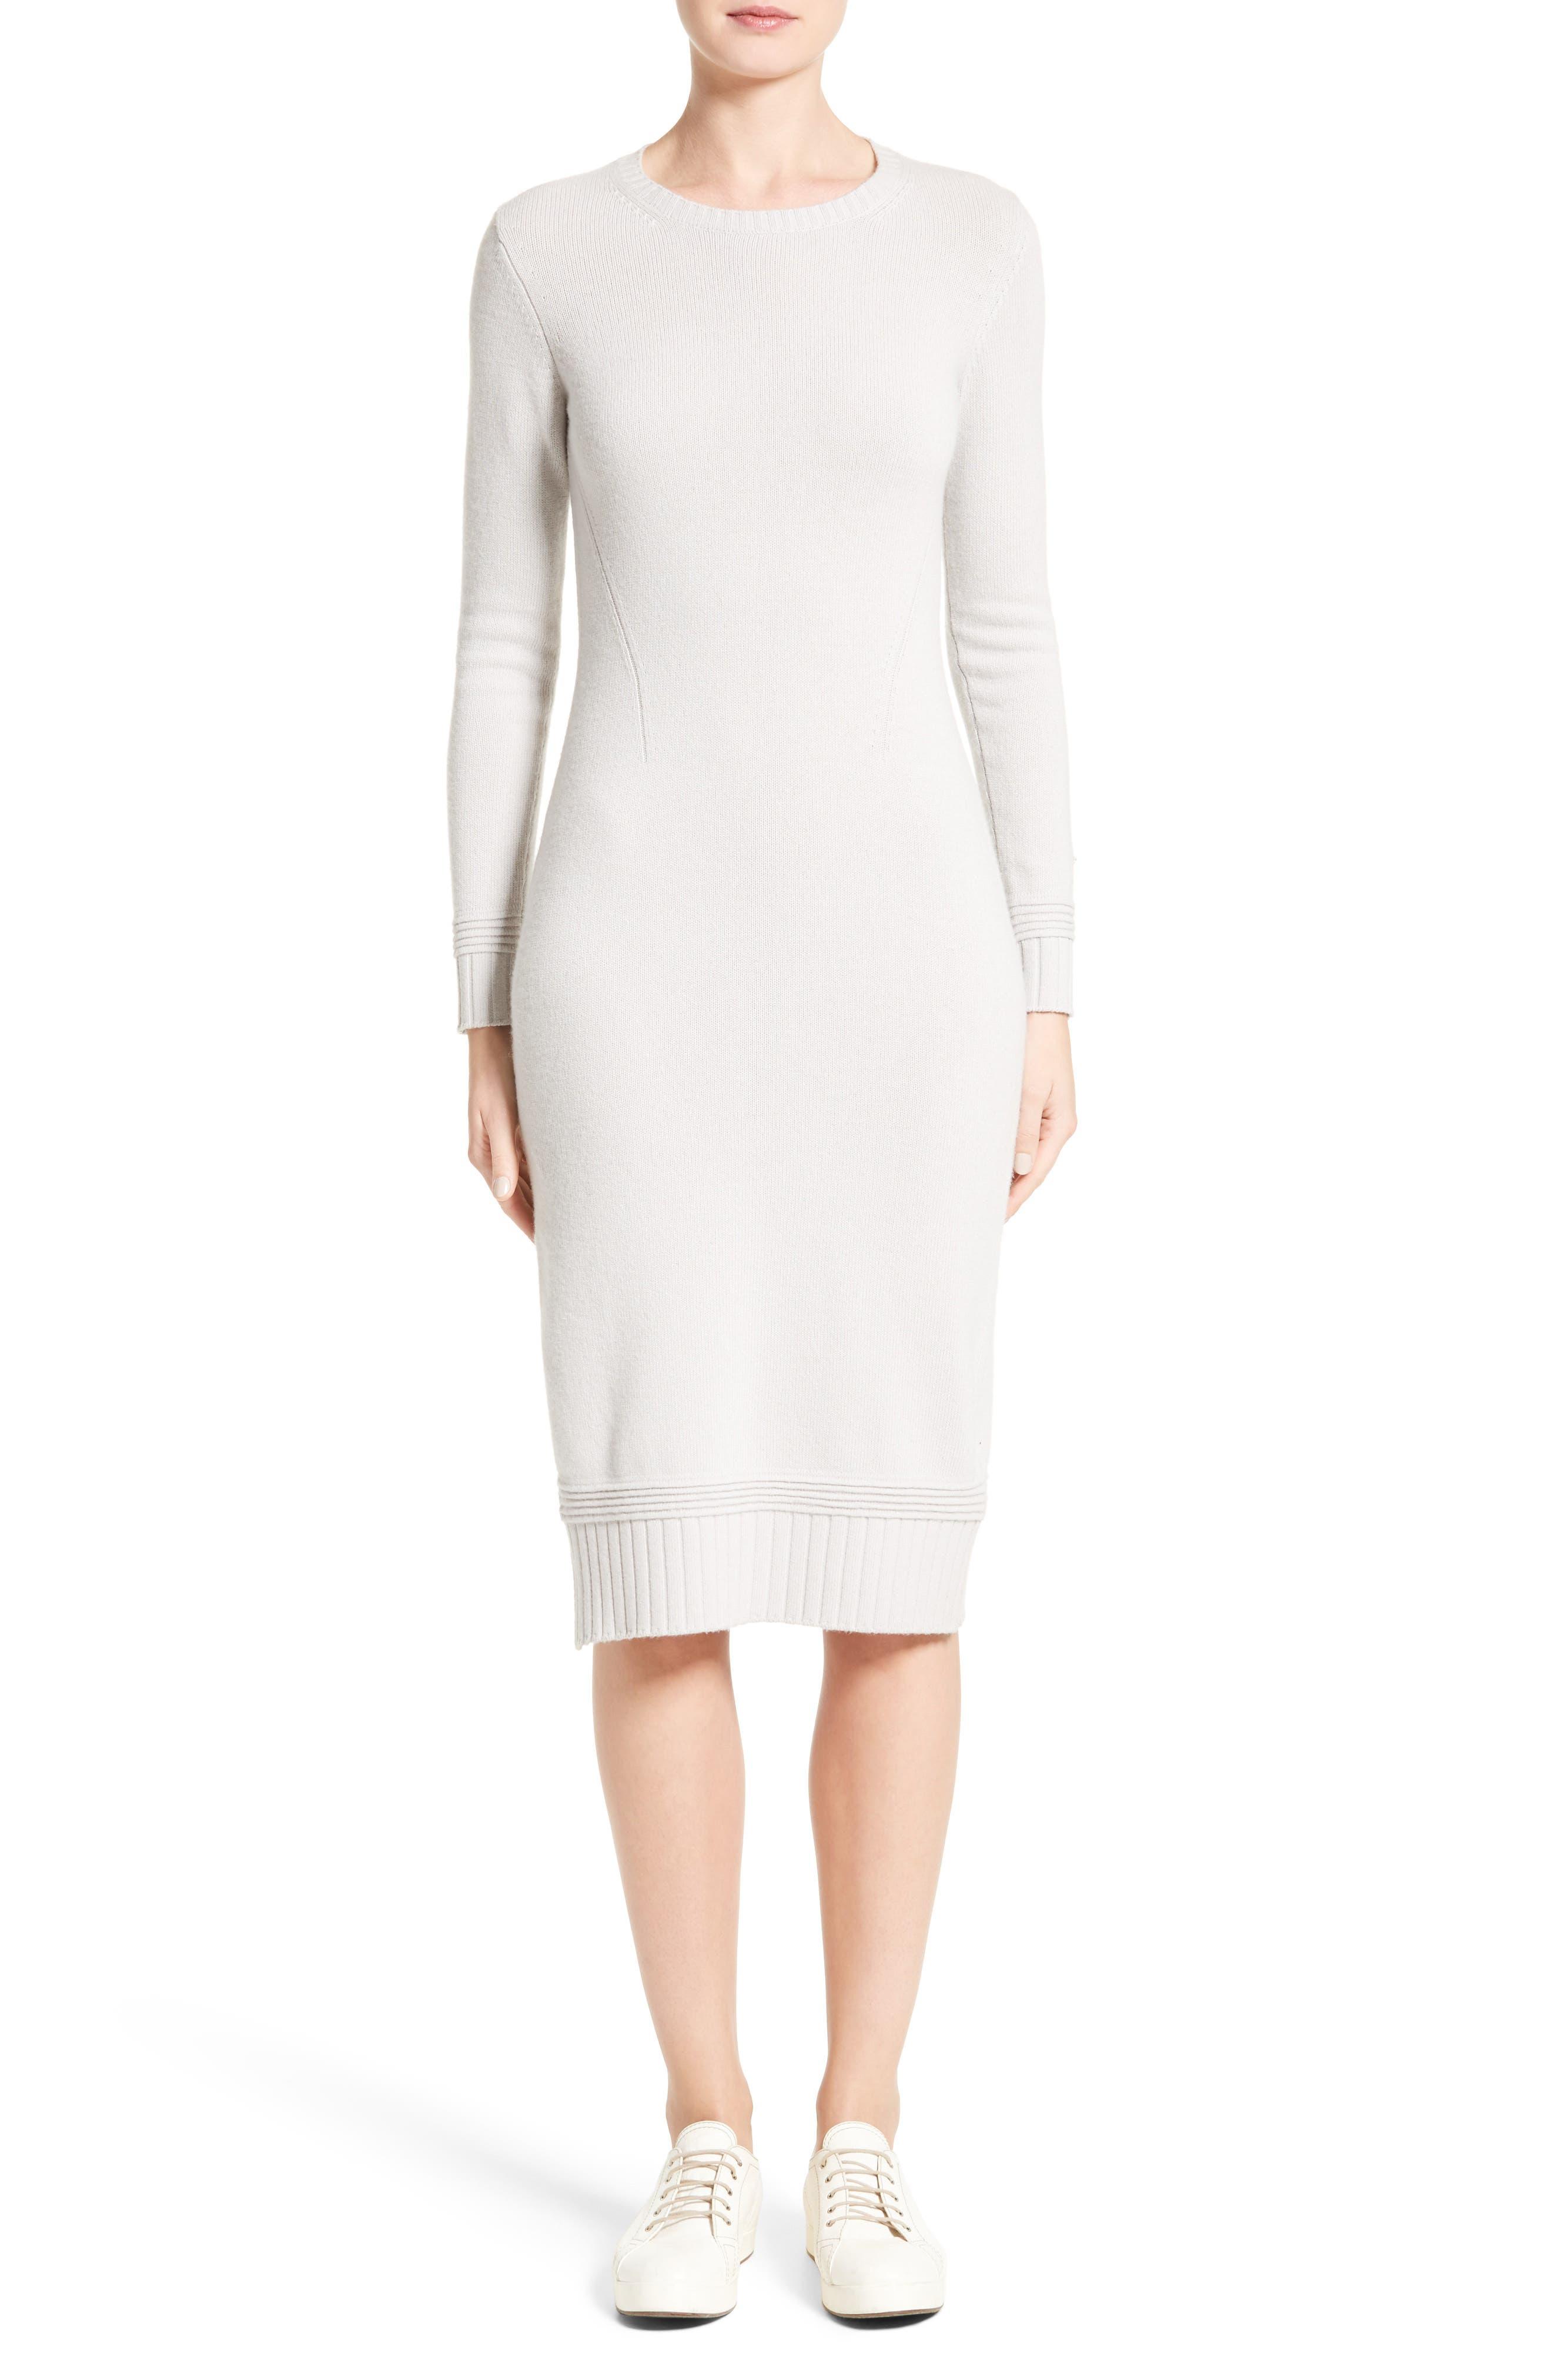 Armani Jeans Knit Sweater Dress,                         Main,                         color, Light Grey